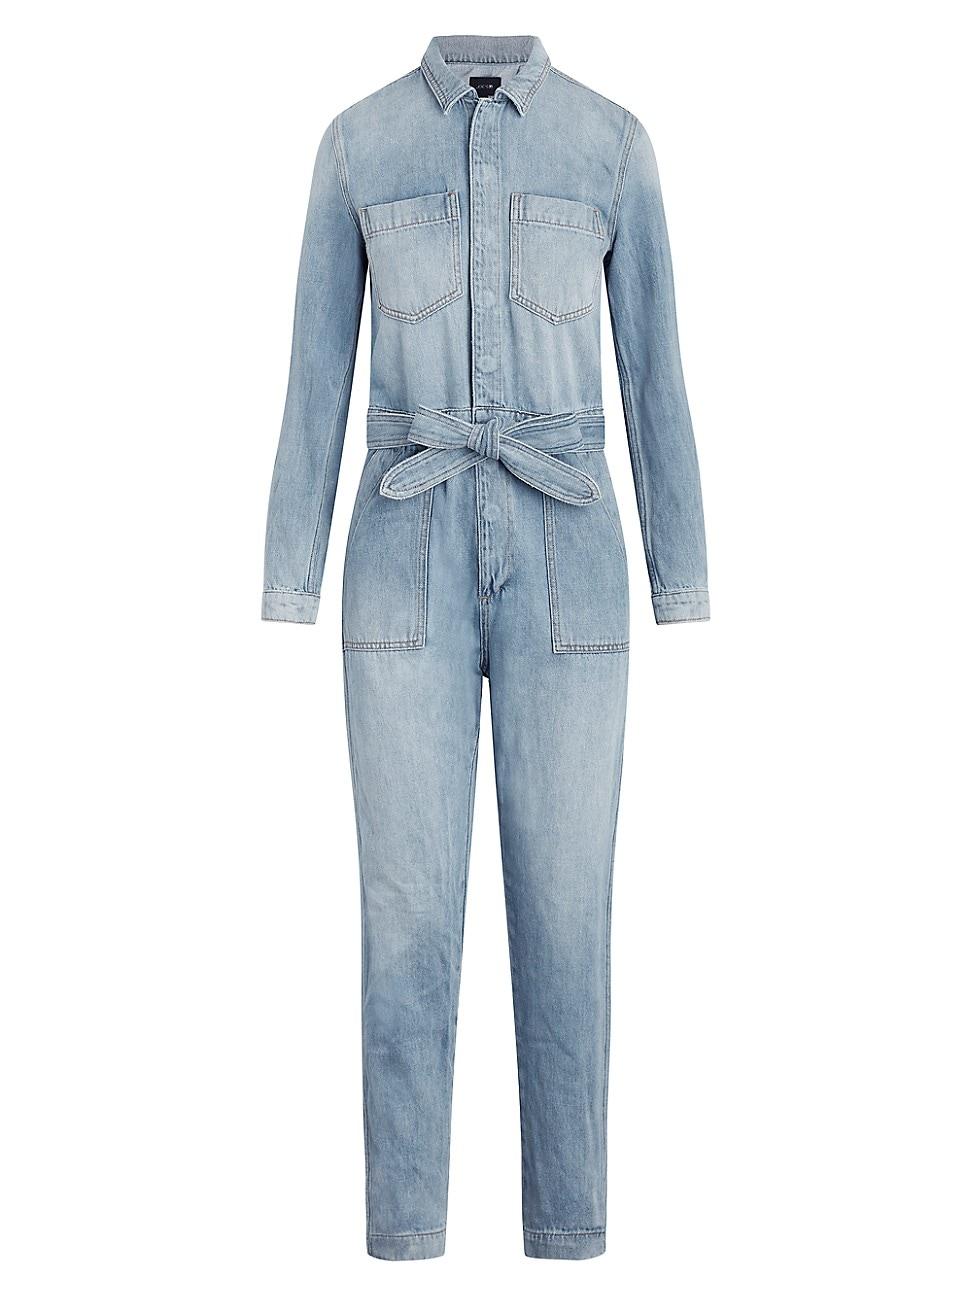 Joe's Jeans Denims WOMEN'S THE ALEXA BELTED DENIM JUMPSUIT